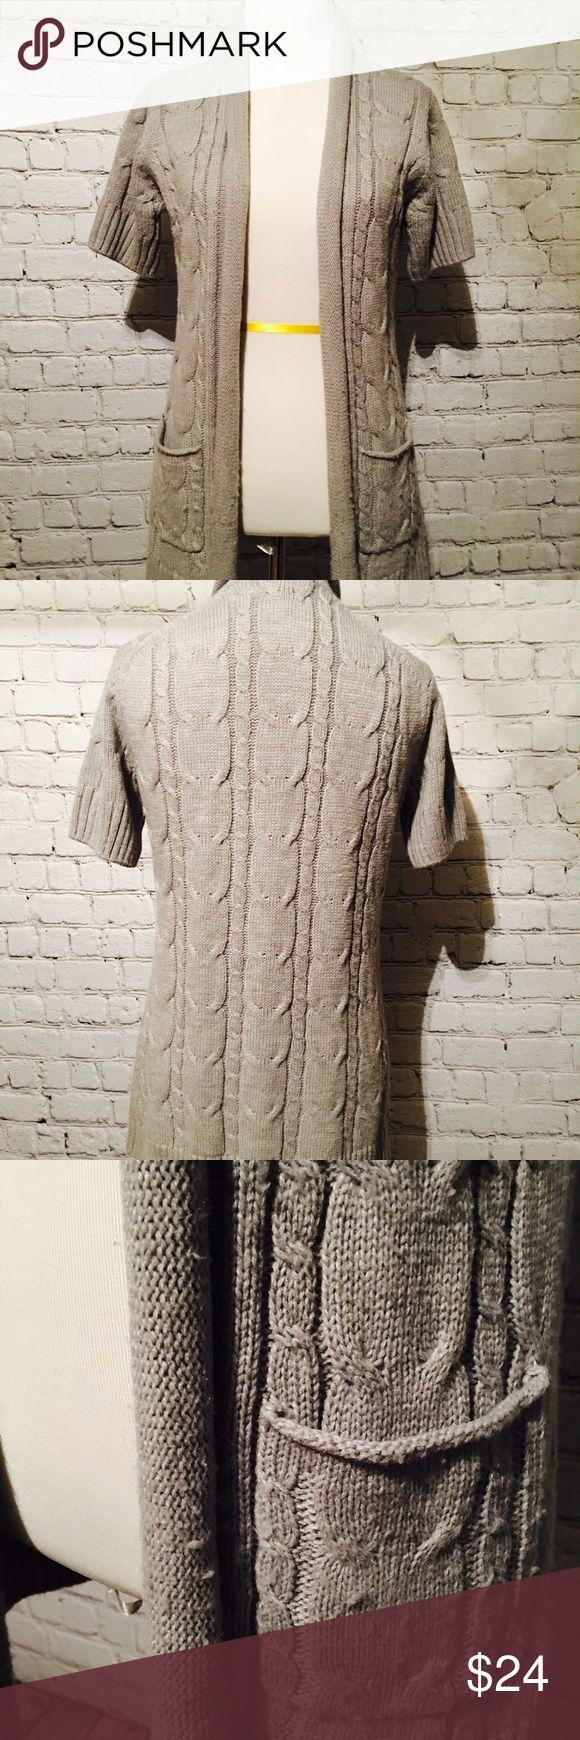 Short sleeve cardigan sweater Gray short sleeve cardigan sweater Caslon Sweaters Cardigans